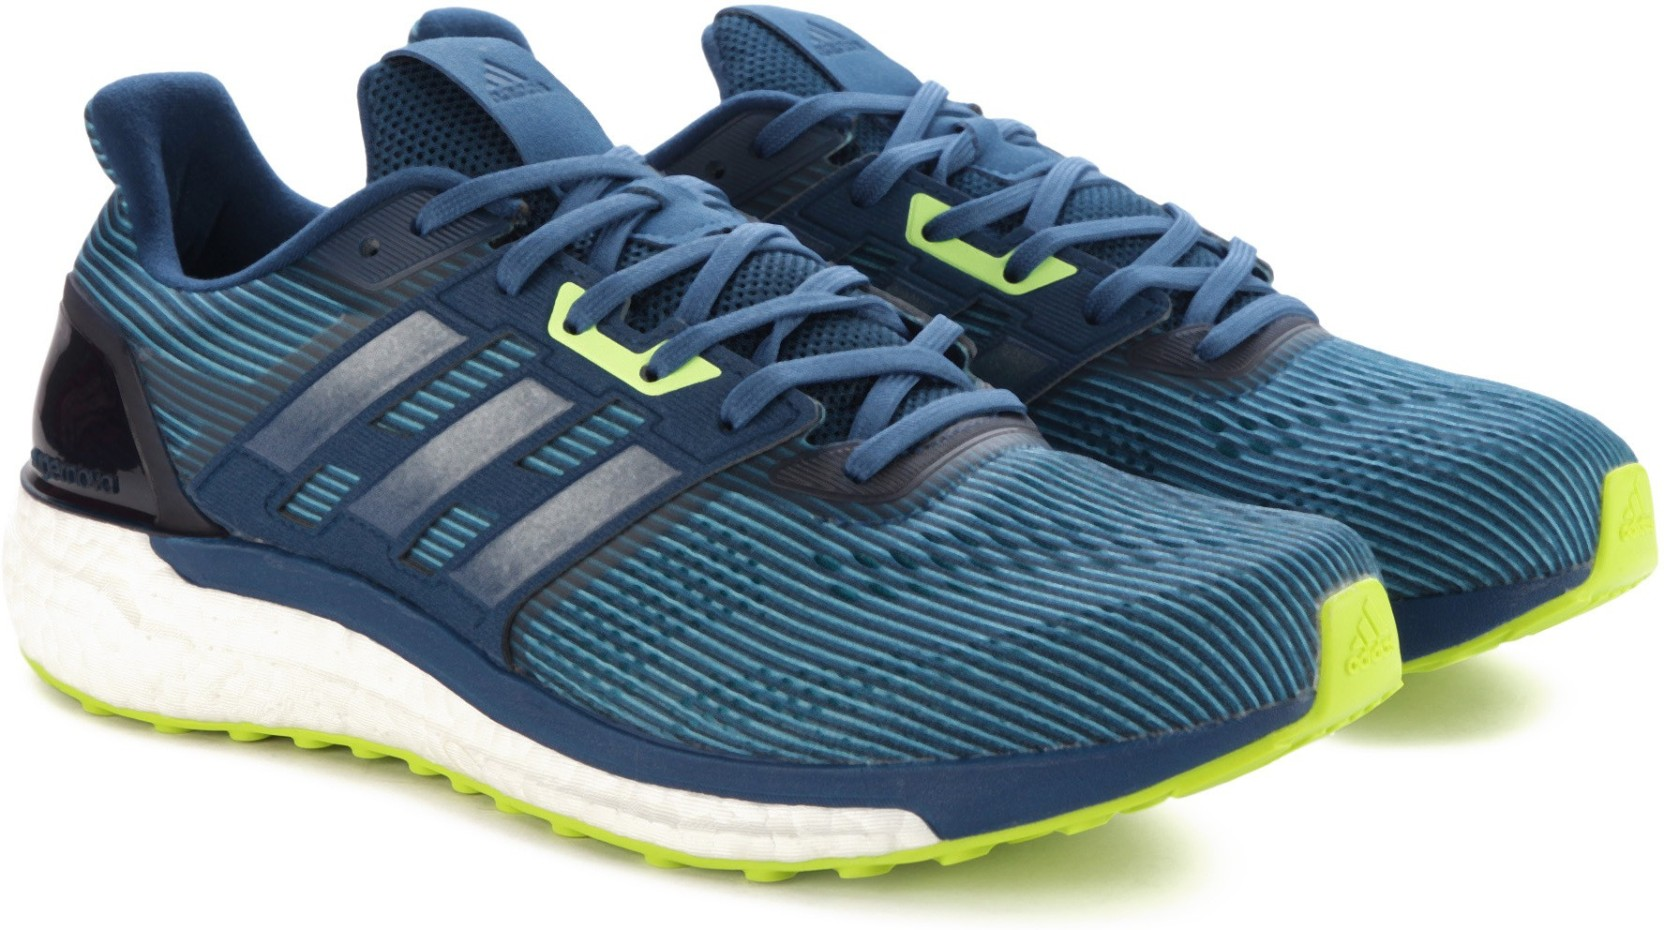 1f61a8aae ADIDAS SUPERNOVA M Running Shoes For Men - Buy VAPBLU BLUNIT CORBLU ...